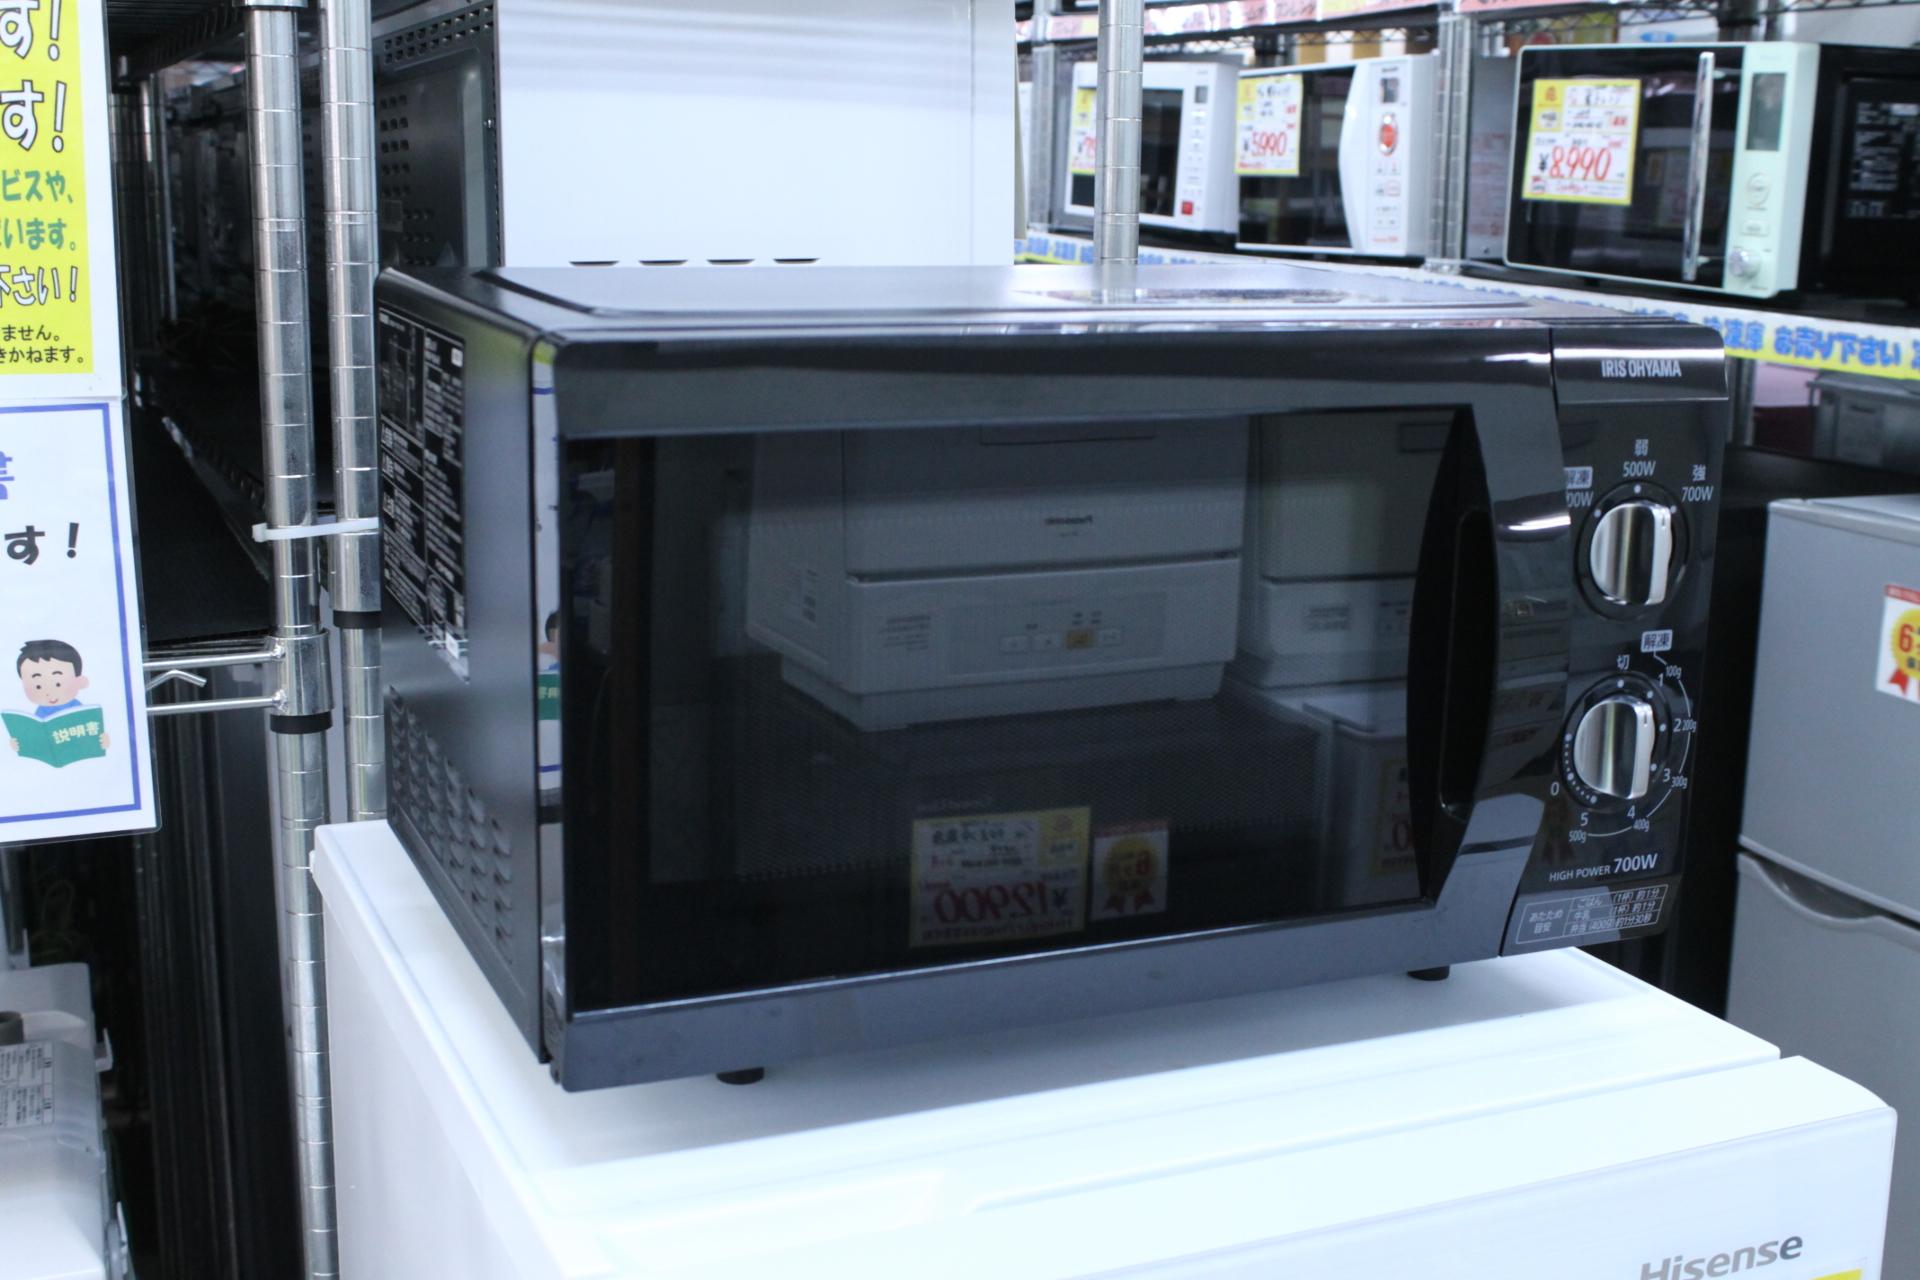 【IRIS OHYAMA アイリスオーヤマ 2019年製 電子レンジ PMB-F185-6 シンプル操作 単機能レンジ】を買取させて頂きました!の買取-